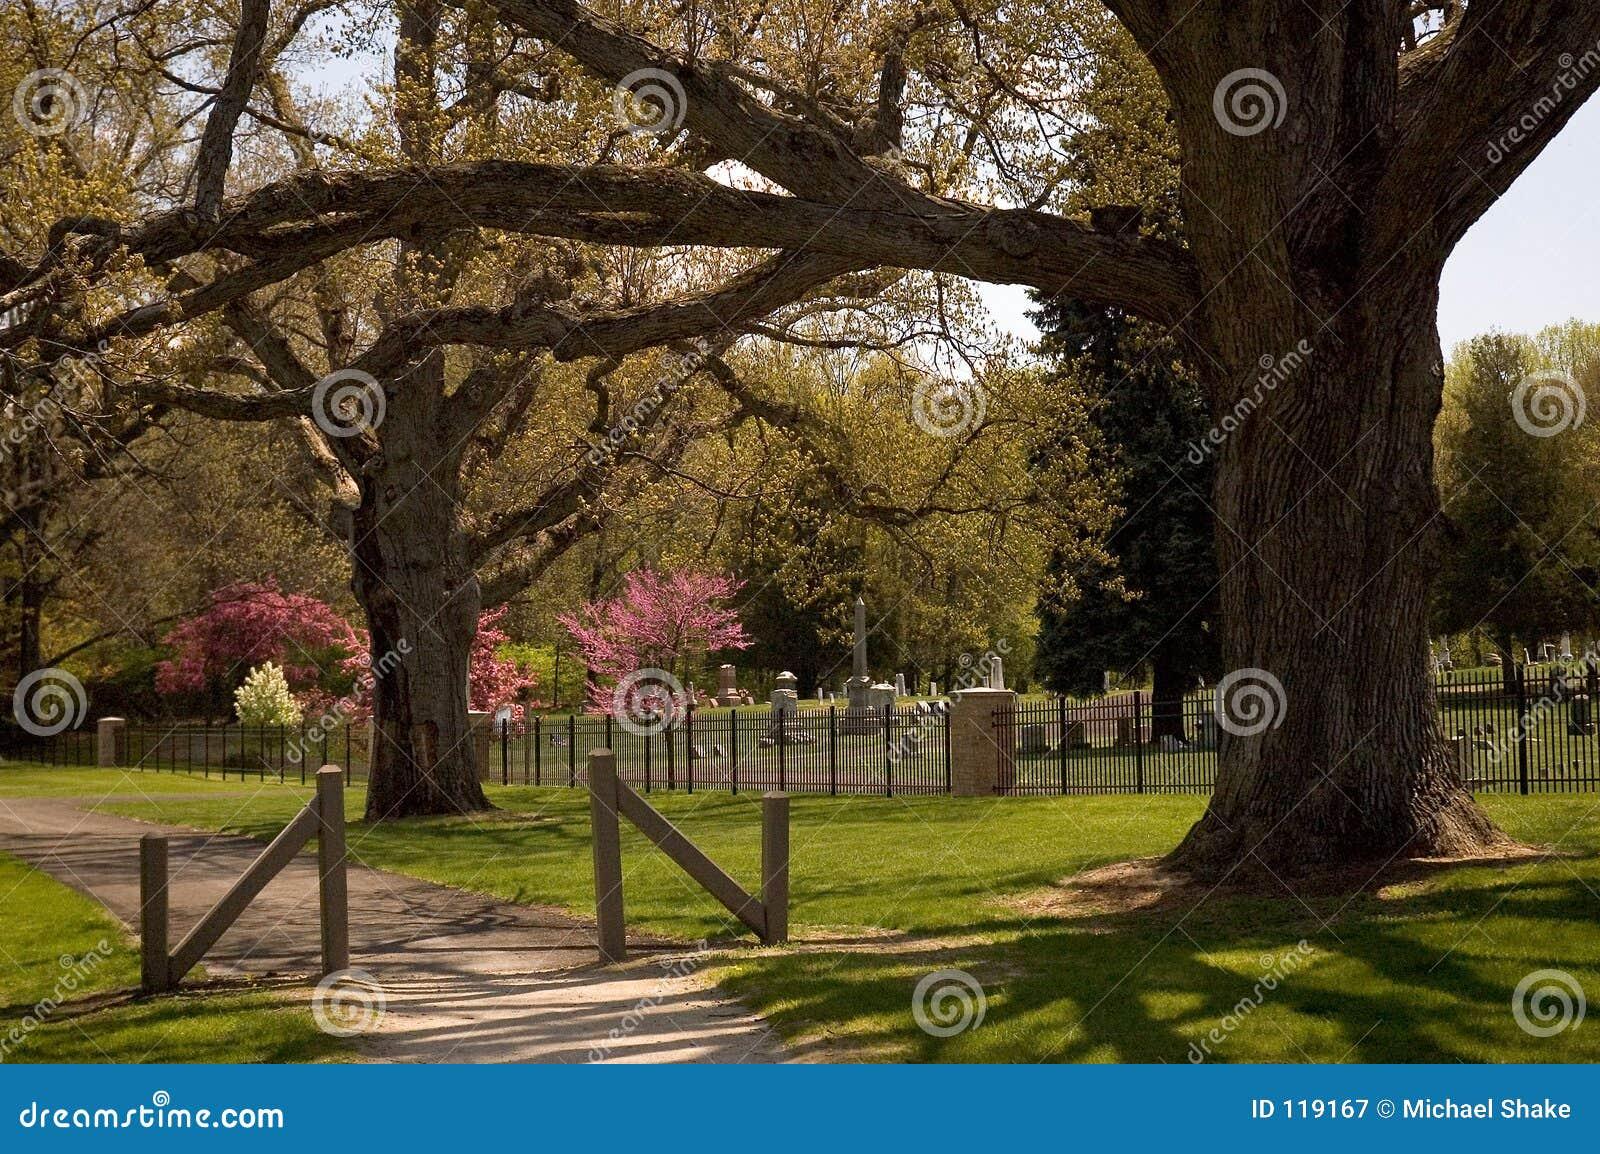 Majestic Oaks Guard a Cemetery